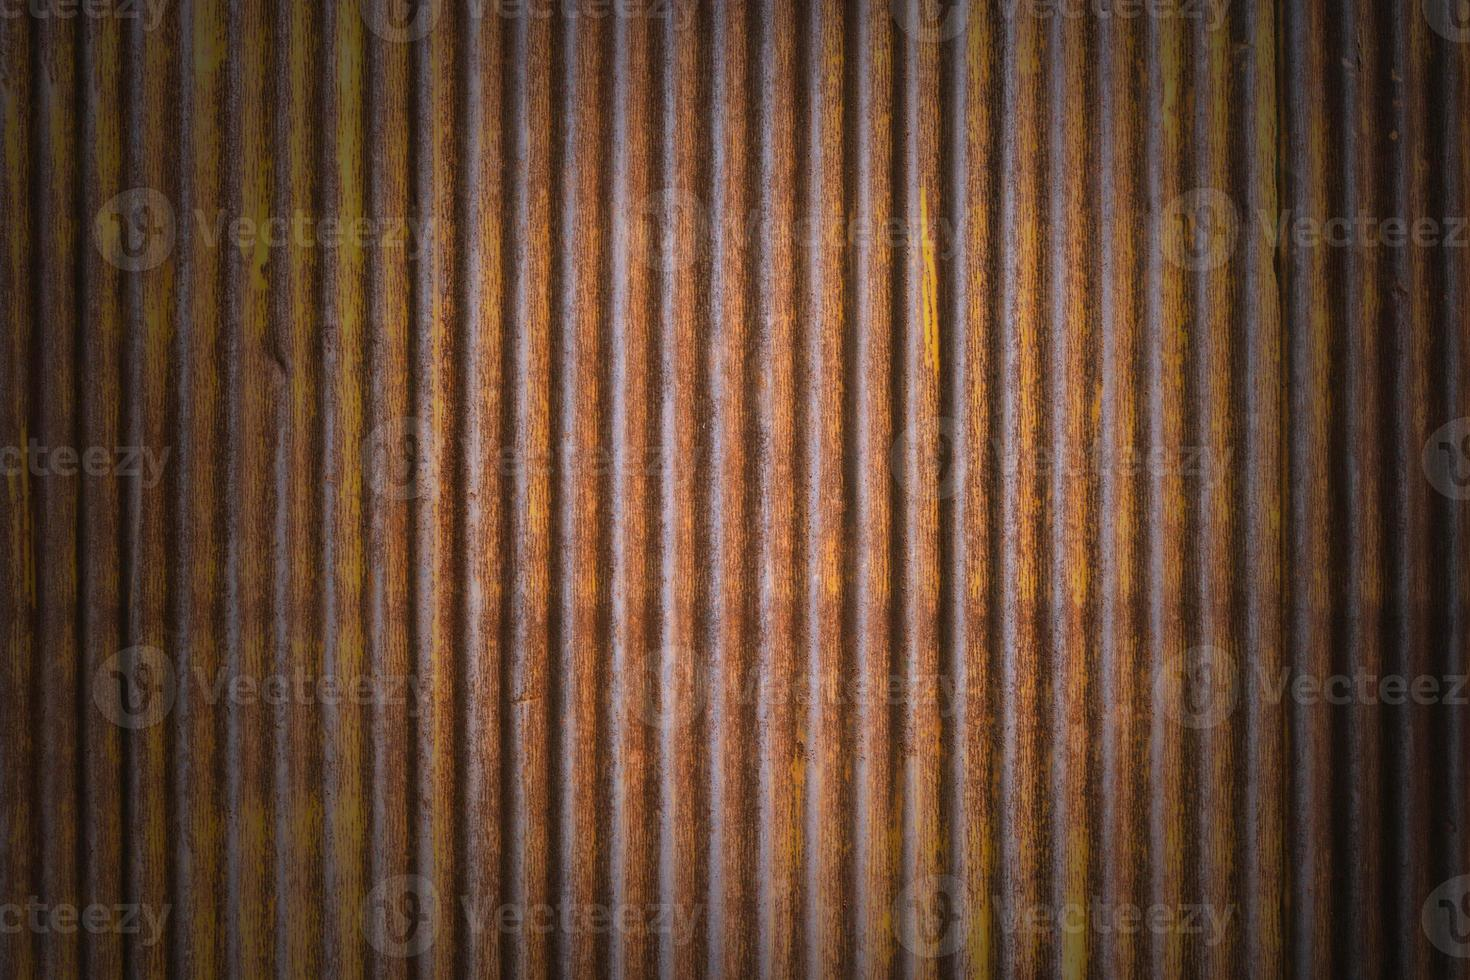 Fondo de pared de textura de zinc grunge marrón foto